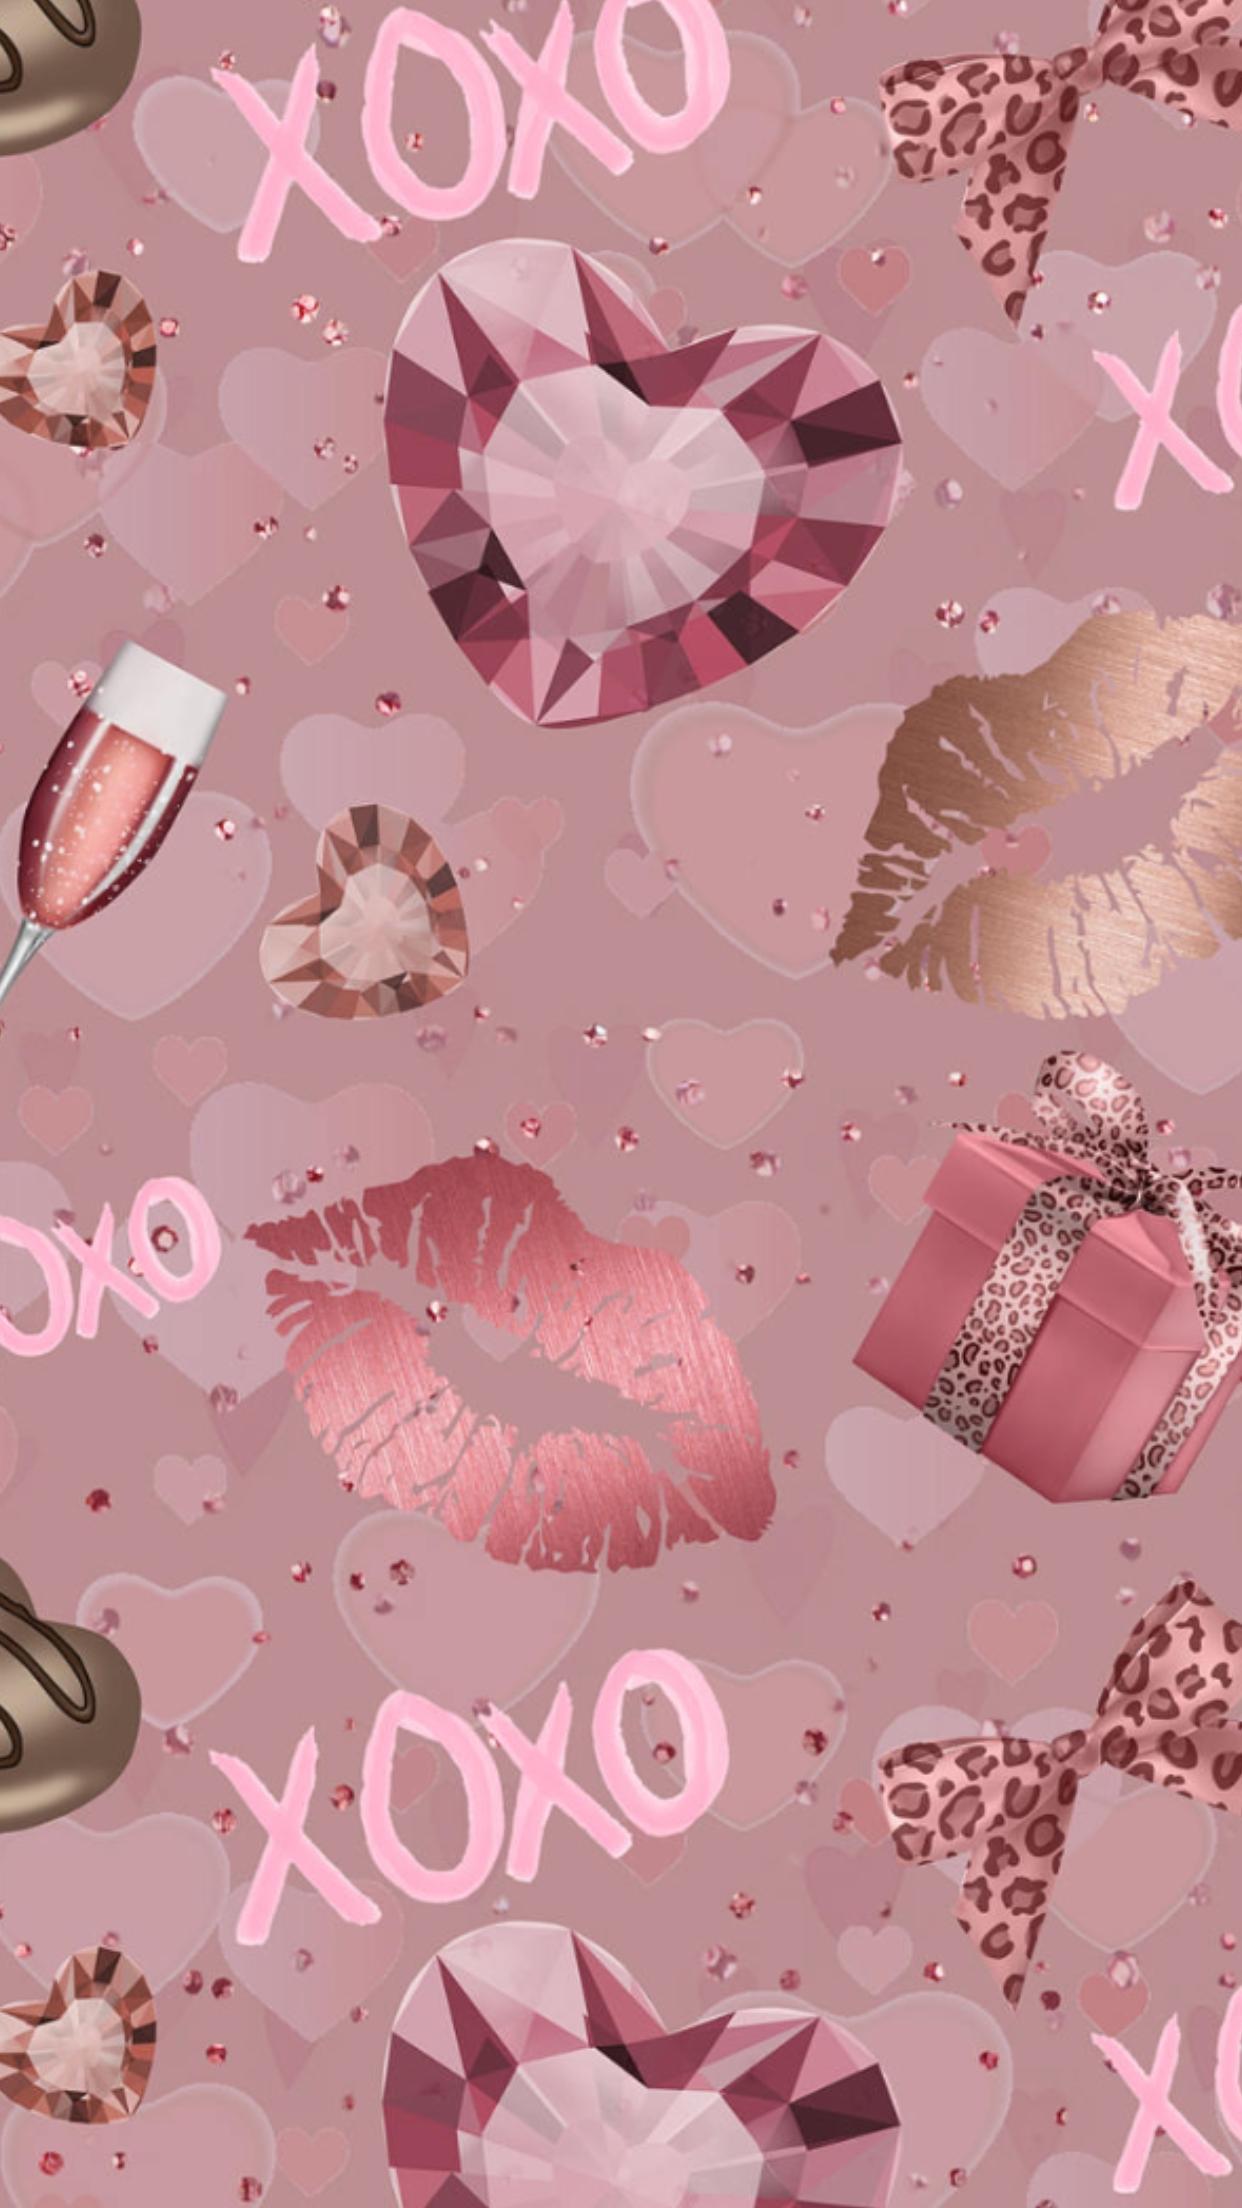 Rose Good Kisses Pinklips Gold Wallpaper Background Pretty Wallpapers Rose Gold Wallpaper